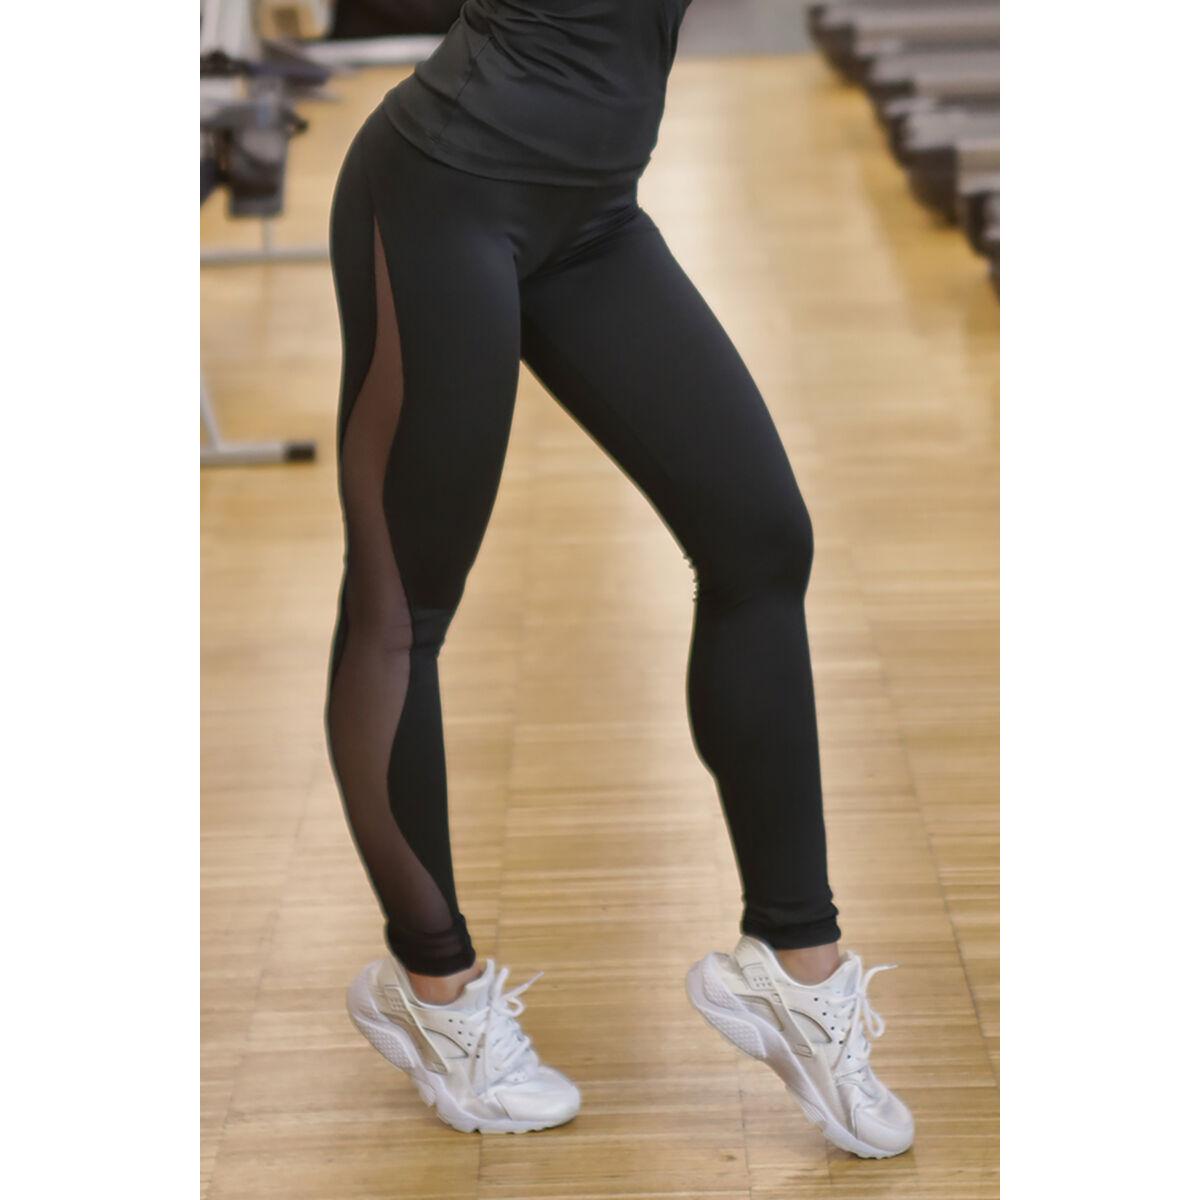 Női tüllbetétes láng fitness leggings, fekete